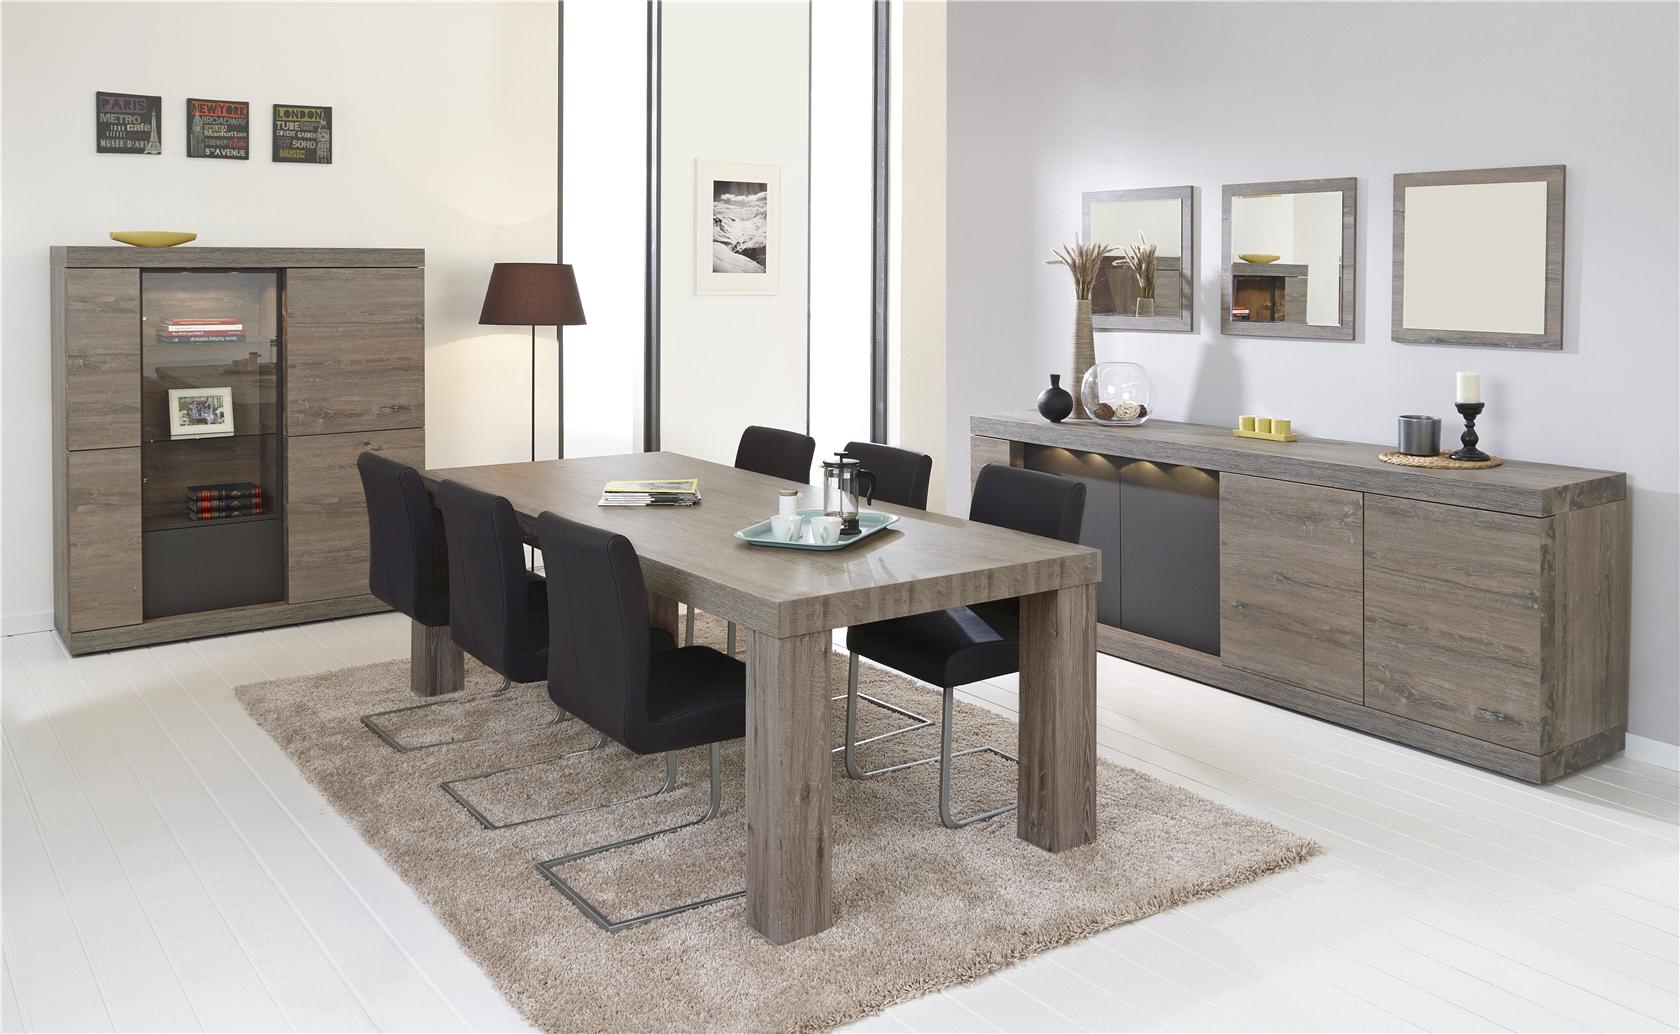 Moderne eetkamer prijs: eetkamer meubels ronde koop goedkope loten ...